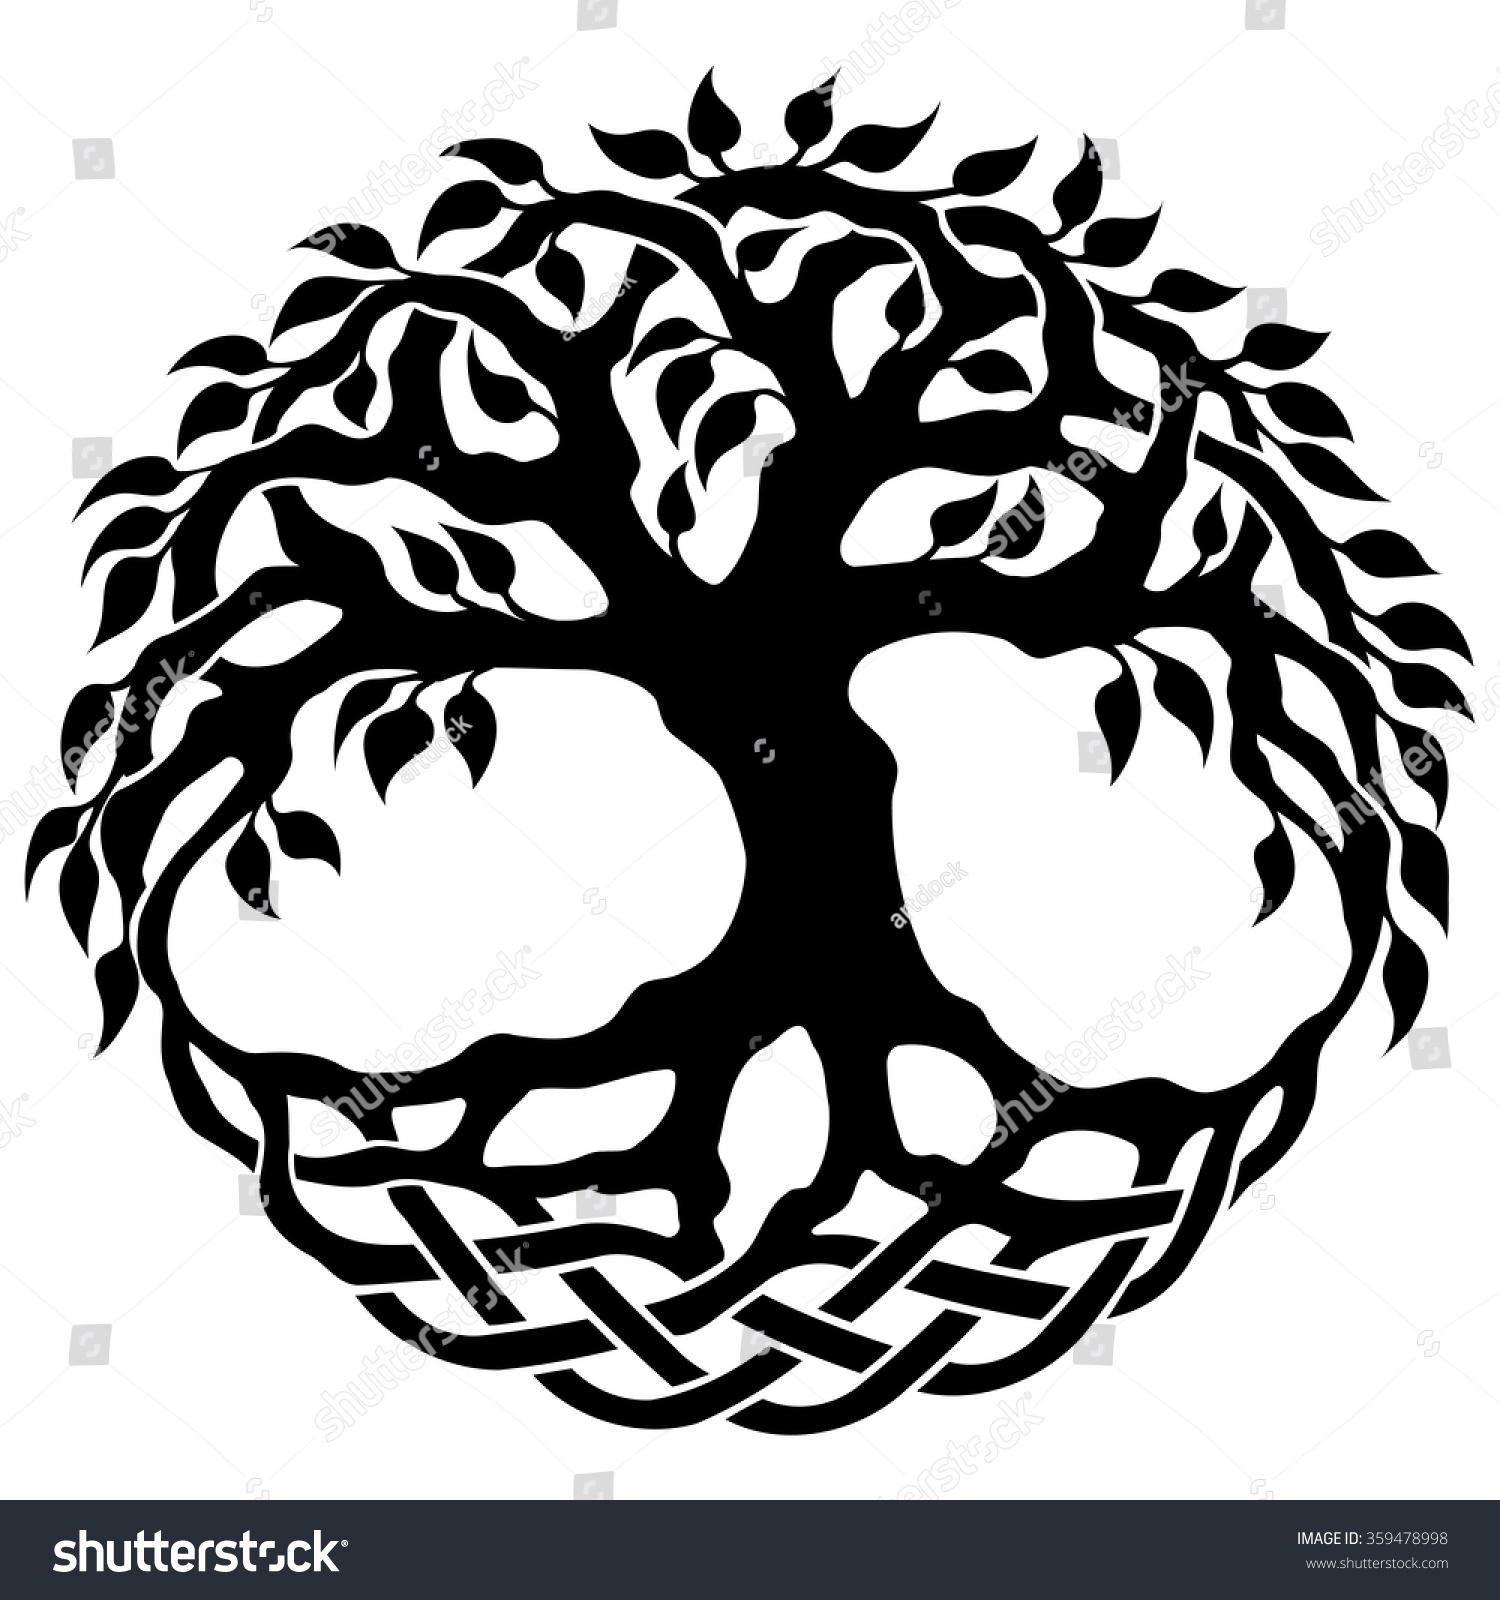 Tree of life ornament - Vector Ornament Decorative Celtic Tree Of Life